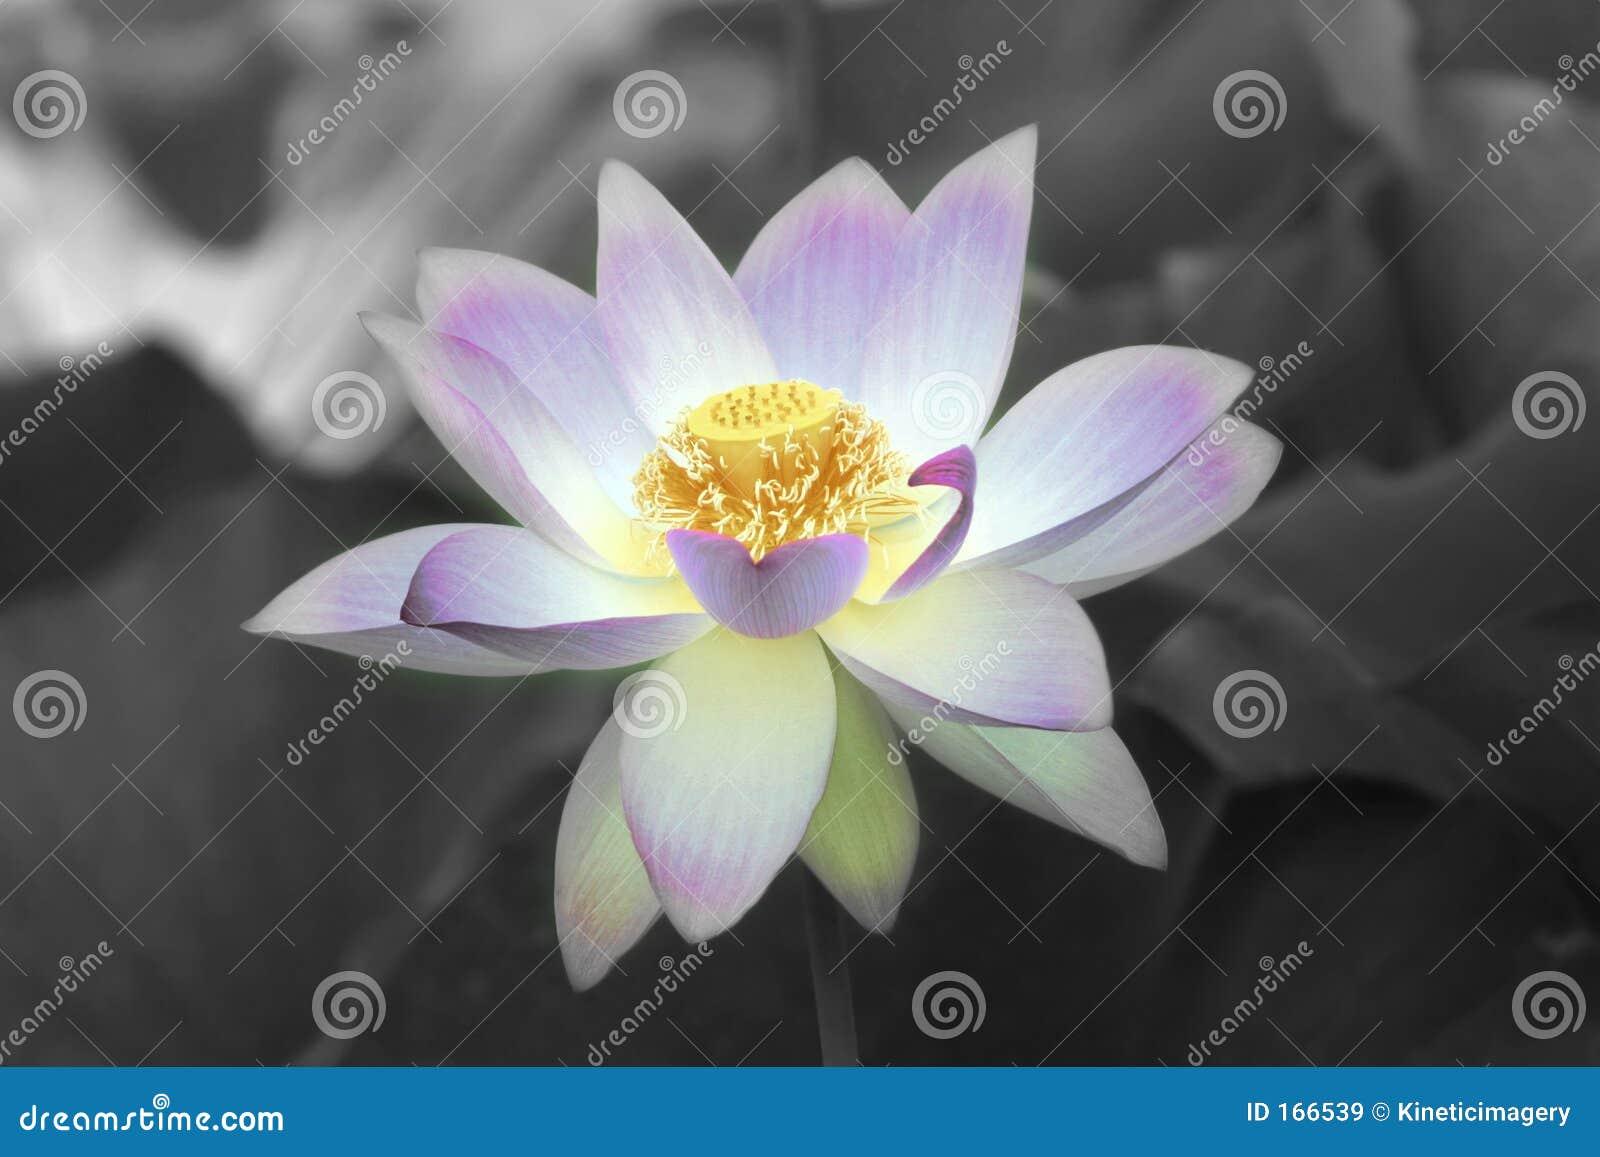 Lotus Flower Stock Image Image Of Conceptual Veins Flora 166539